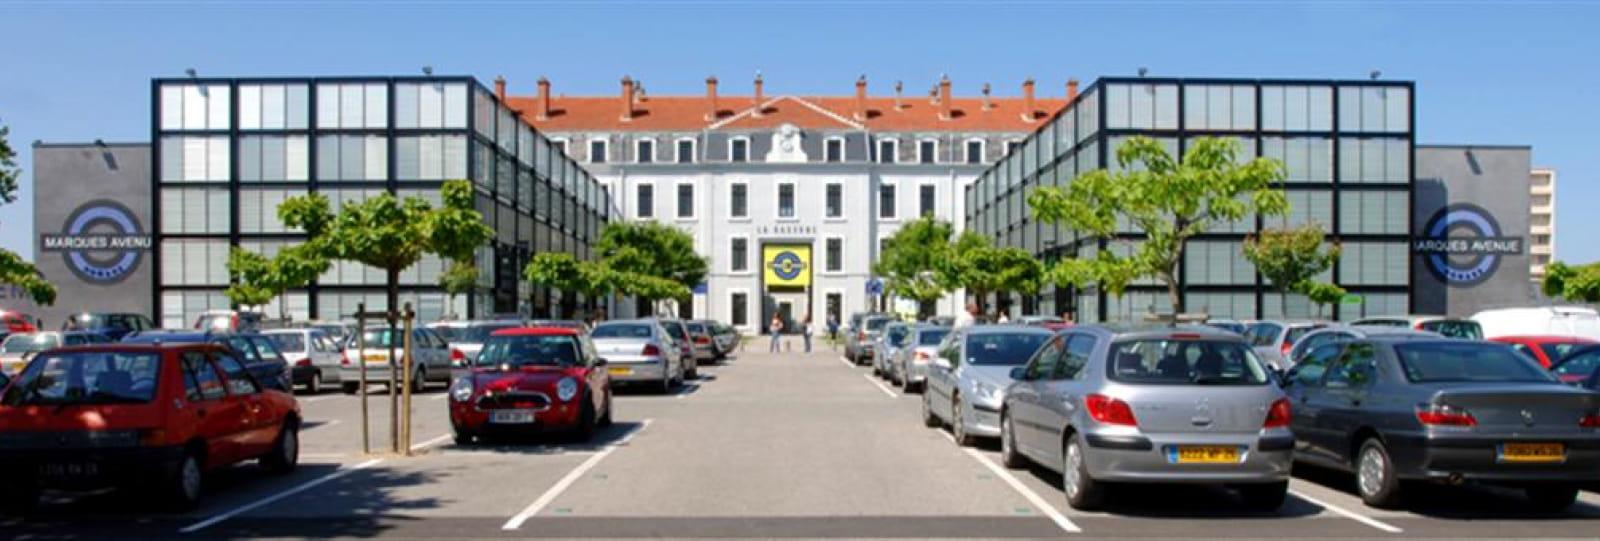 La Caserne Bon : Marques Avenue